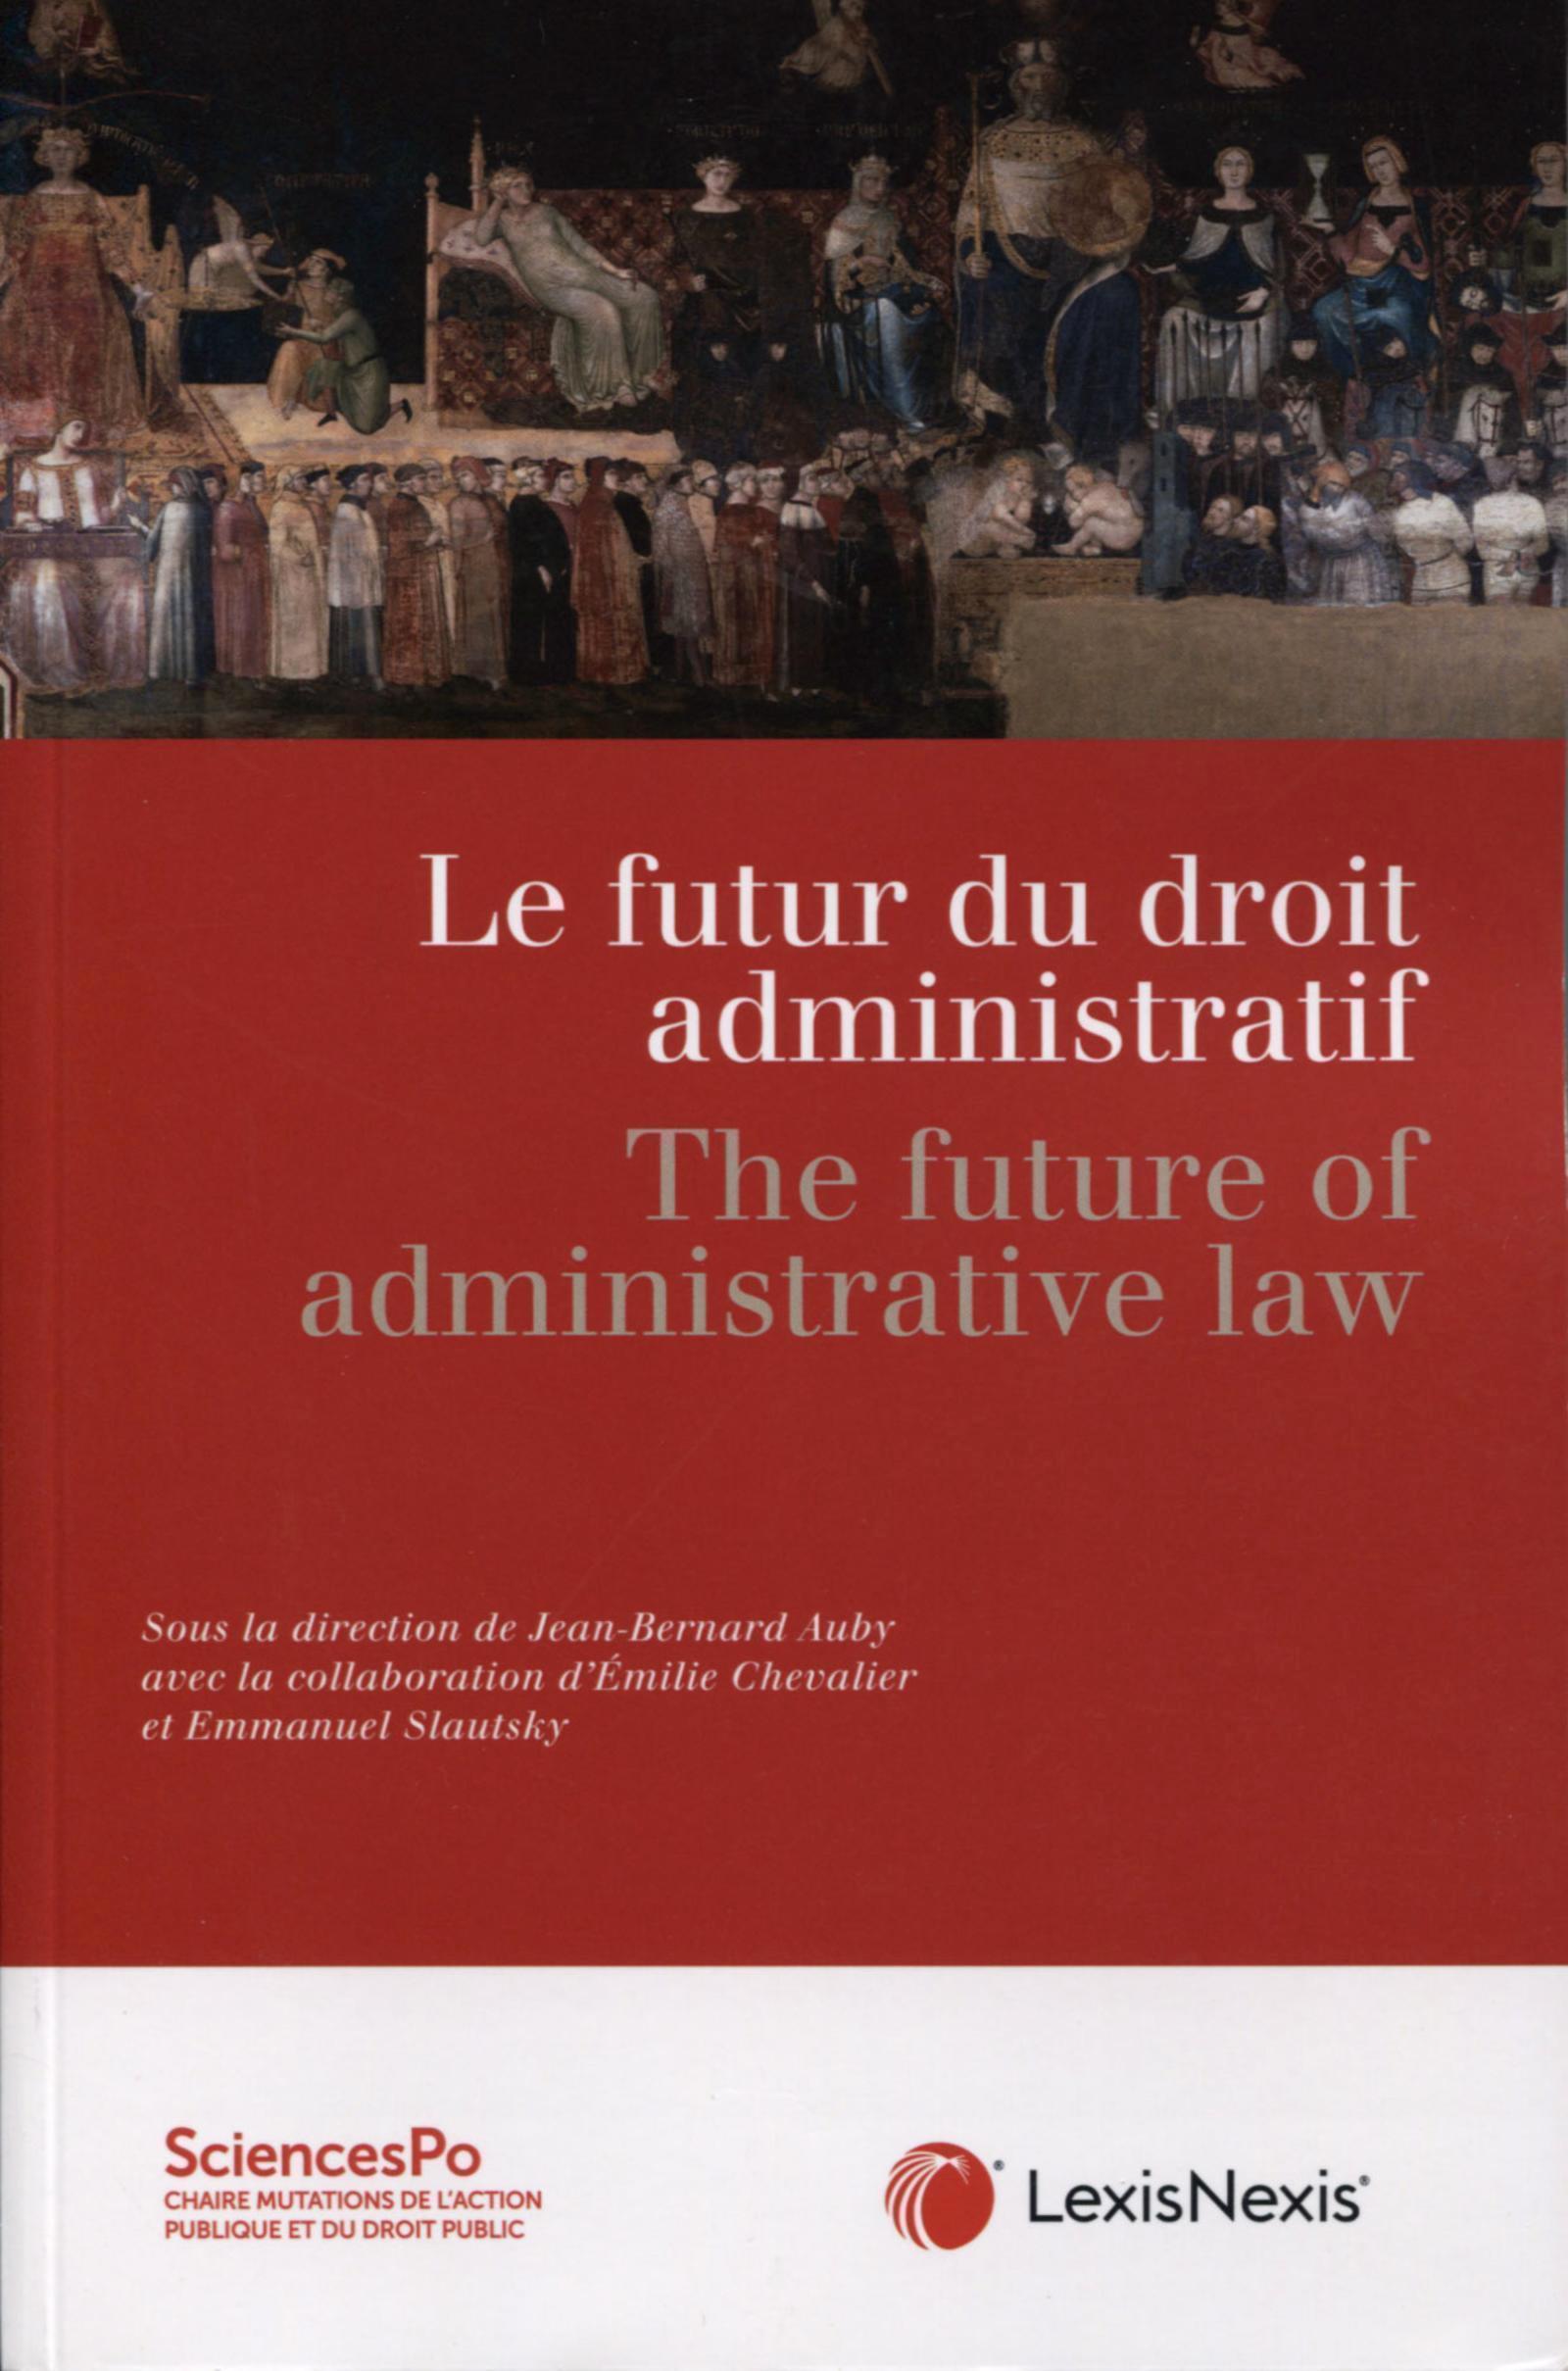 LE FUTUR DU DROIT ADMINISTRATIF - THE FUTURE OF ADMINISTRATIVE LAW